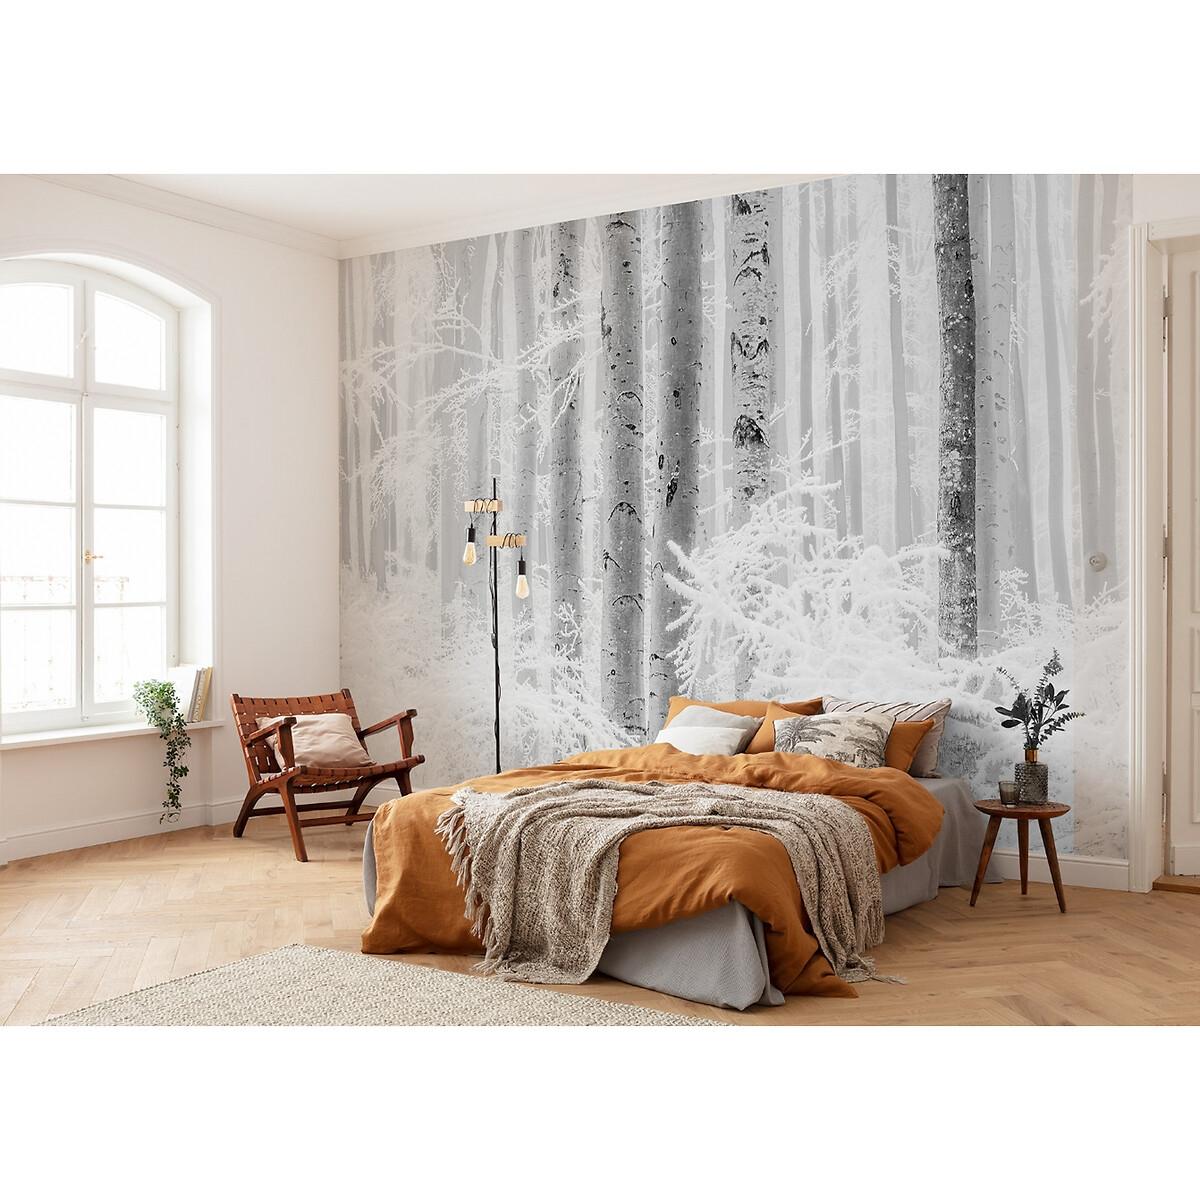 INTERELIFE - Interelife Papel de parede foto mural Winter Wood, da Interelife